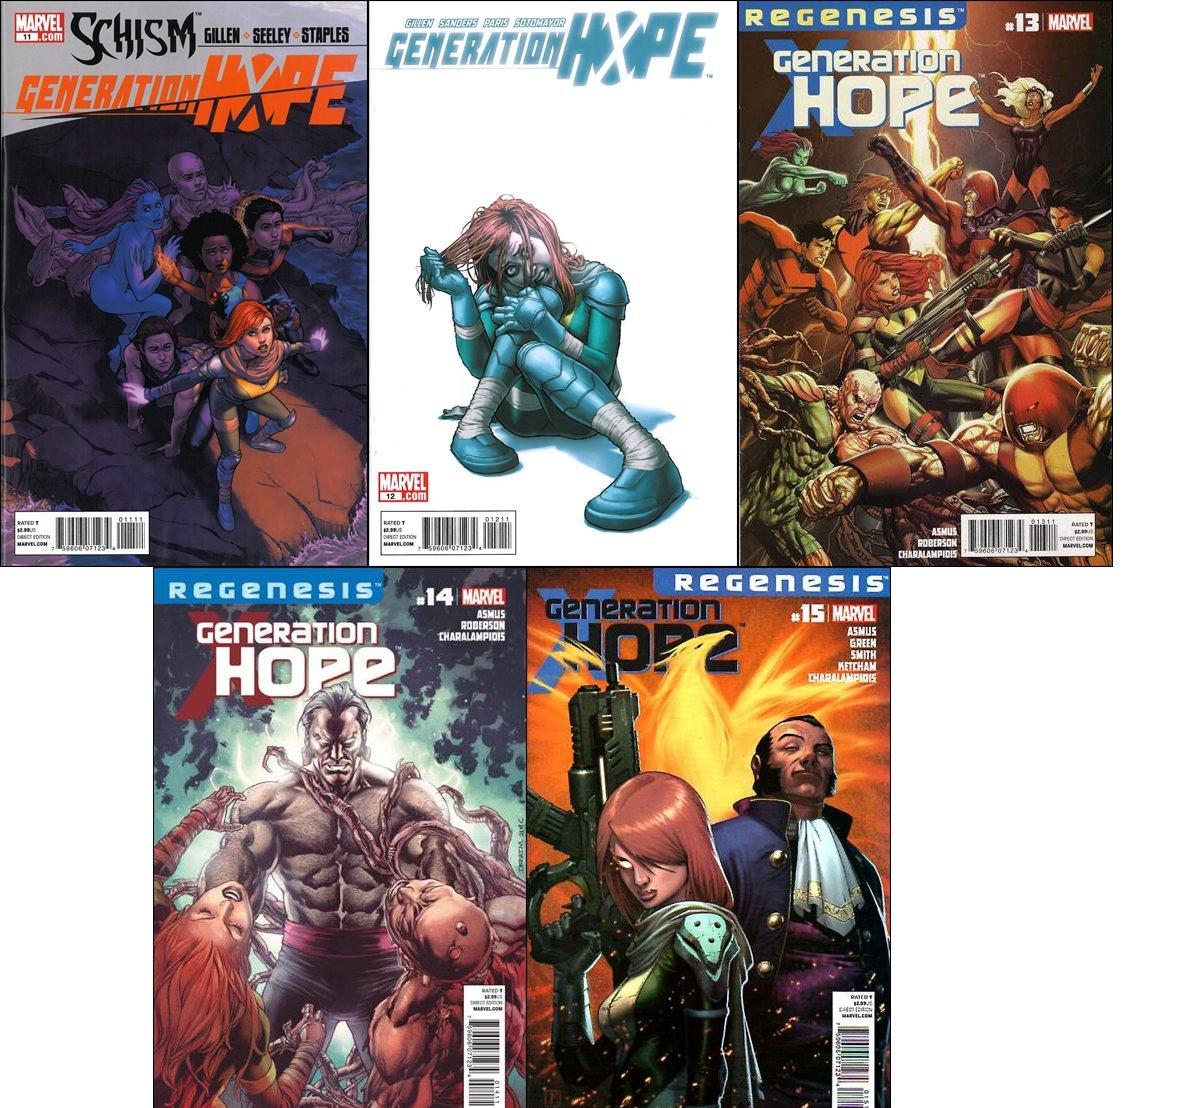 Generation Hope #11 12 13 14 15 Trade Set [2011-2012] VF/NM Marvel Comics